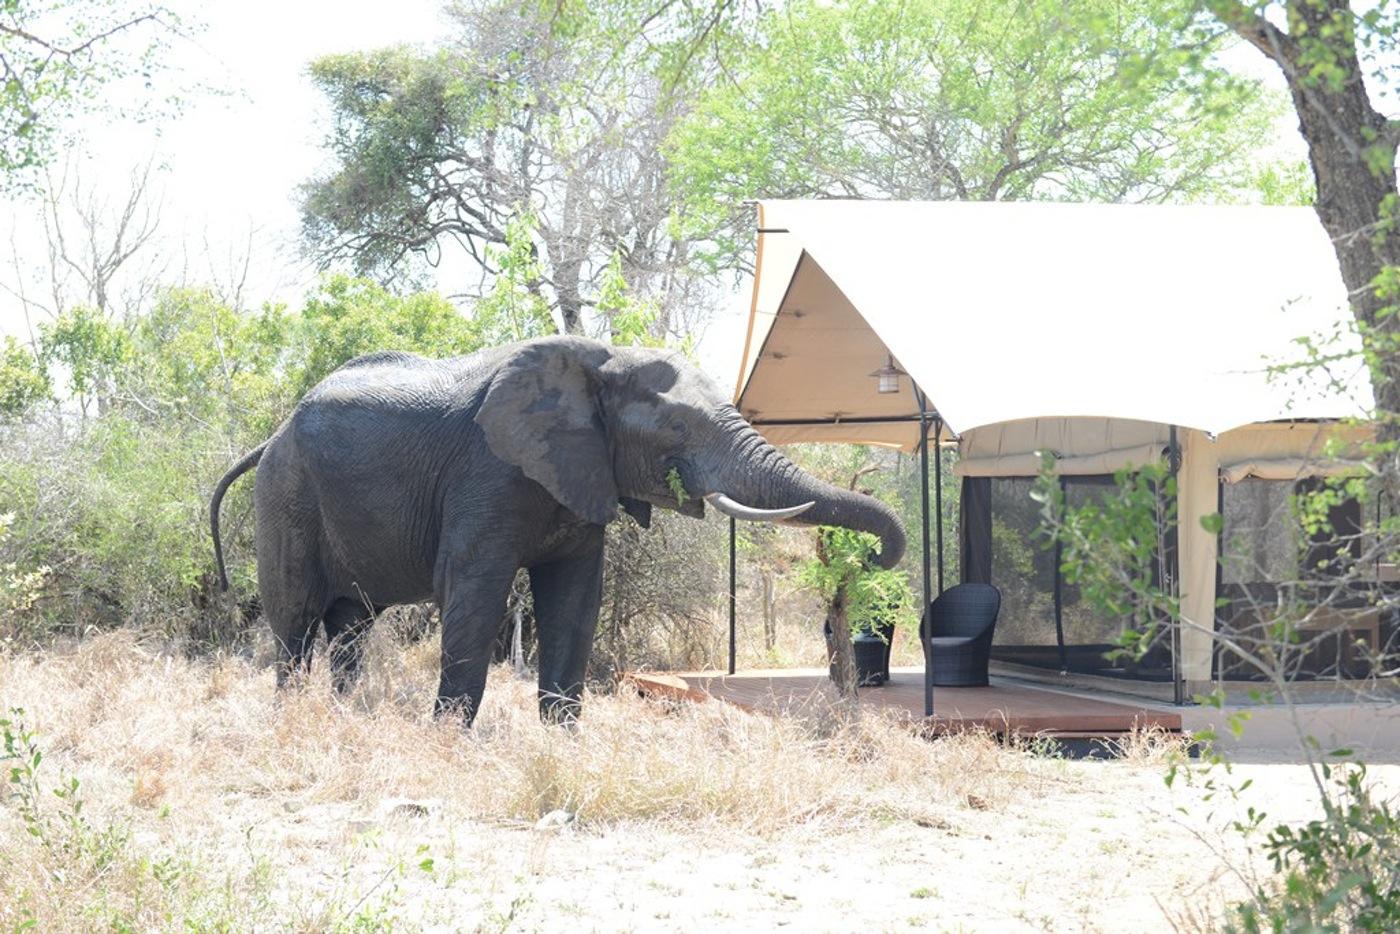 SouthAfrica_HoneyGuide_KhokaMoya_003(1).jpg